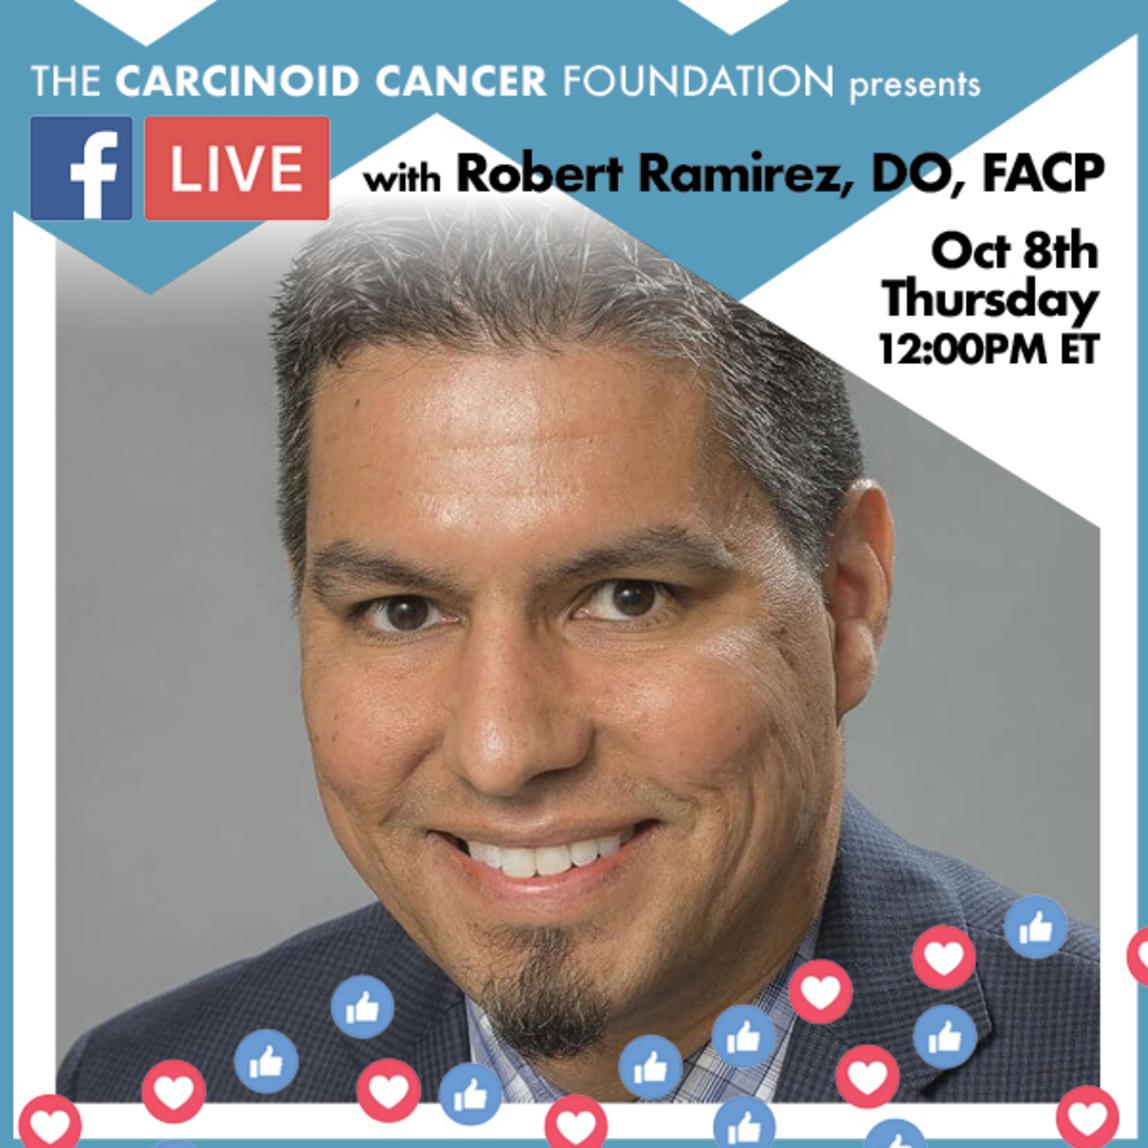 Robert Ramirez, DO, FACP